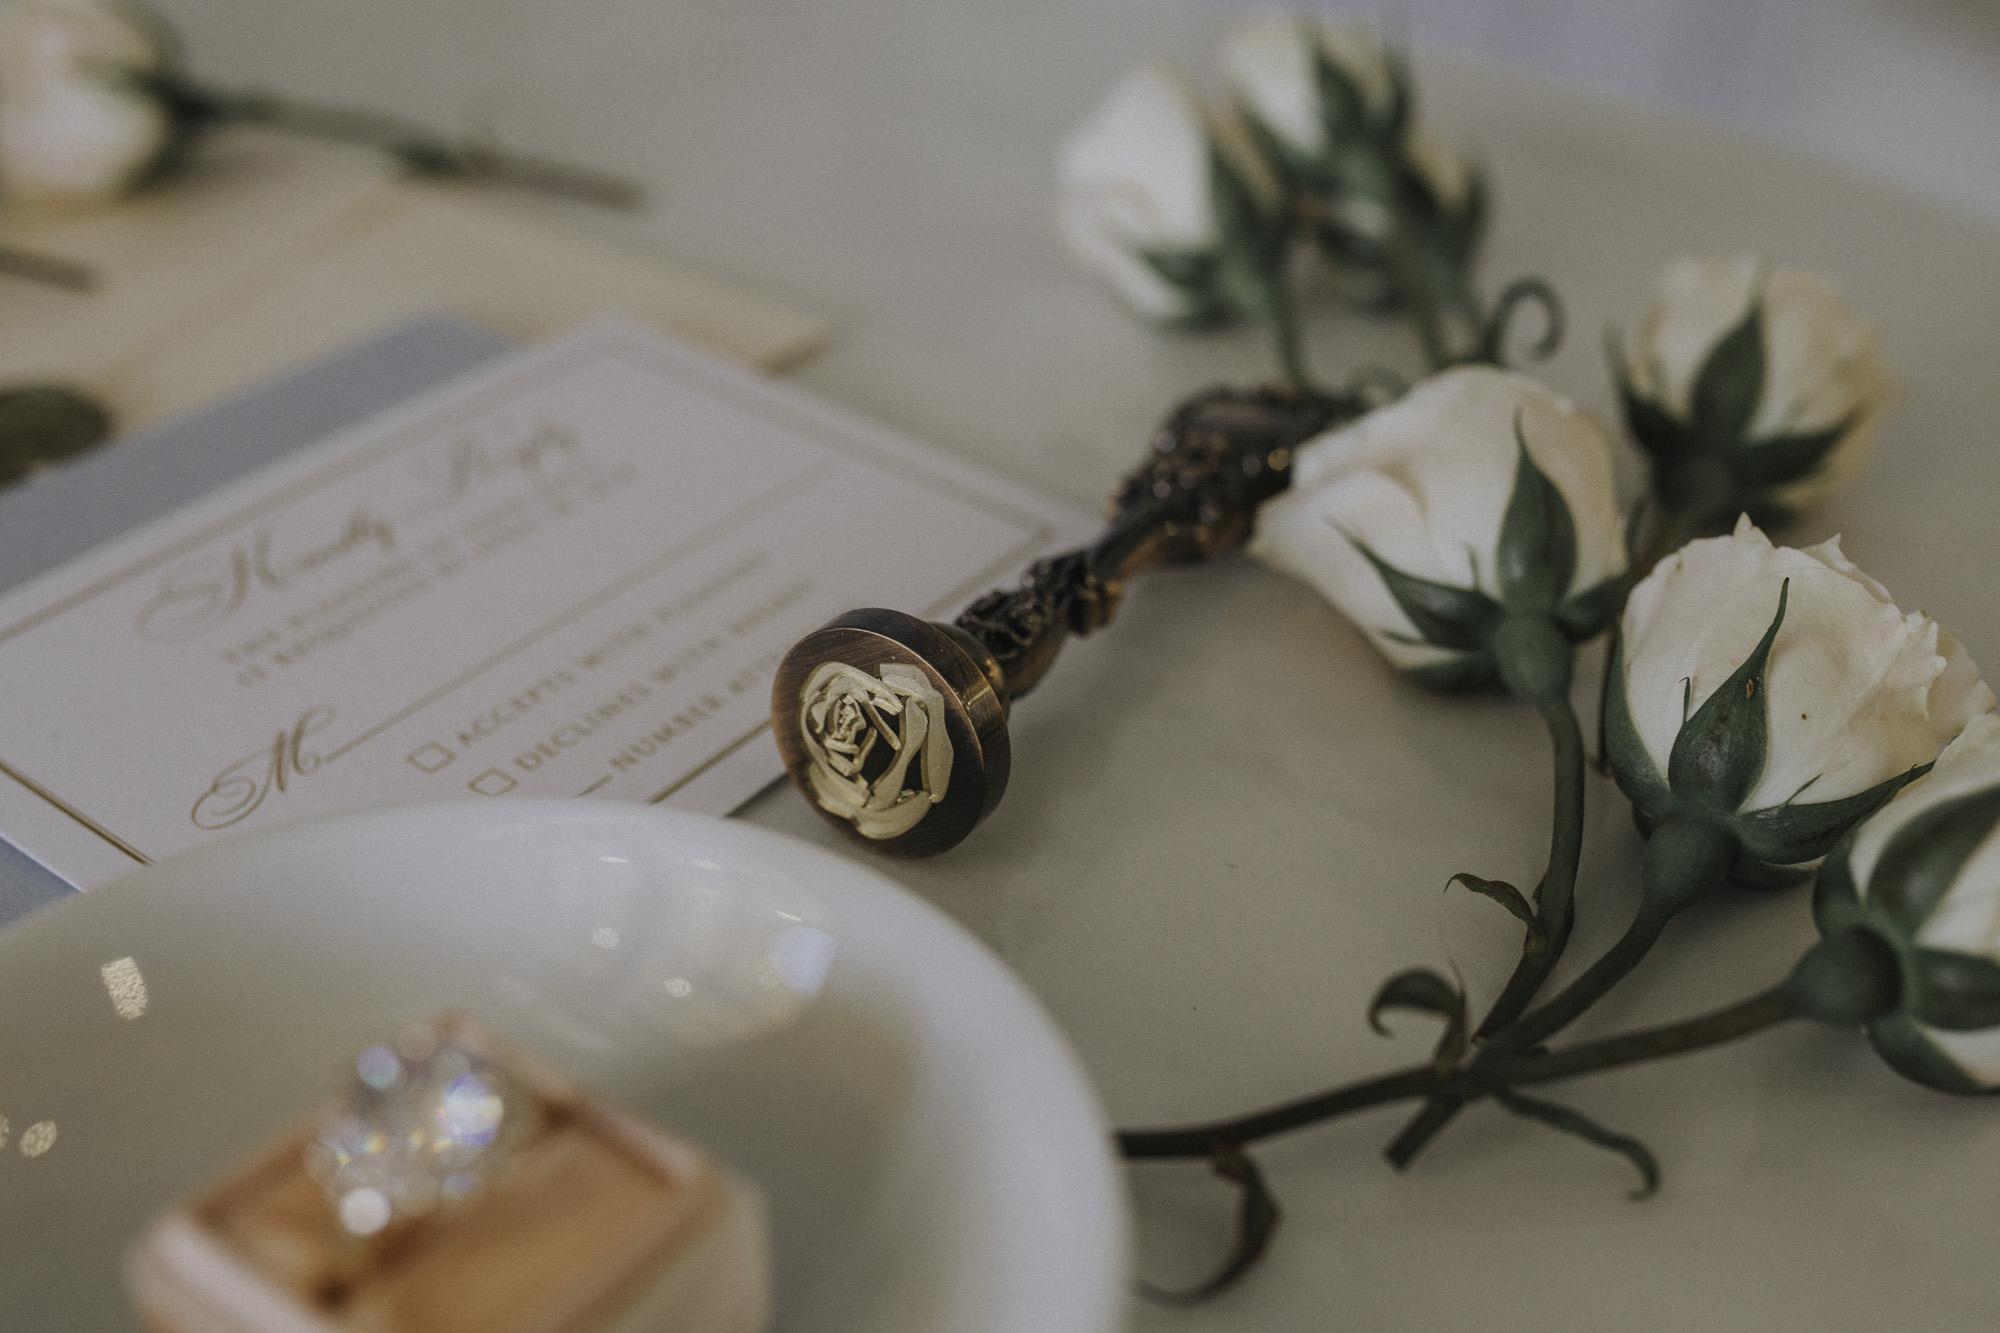 Cate_Ann_Photography_Dayton_Ohio_Wedding_Elopement_And_Engagement_PhotographerIMG_7892.jpg